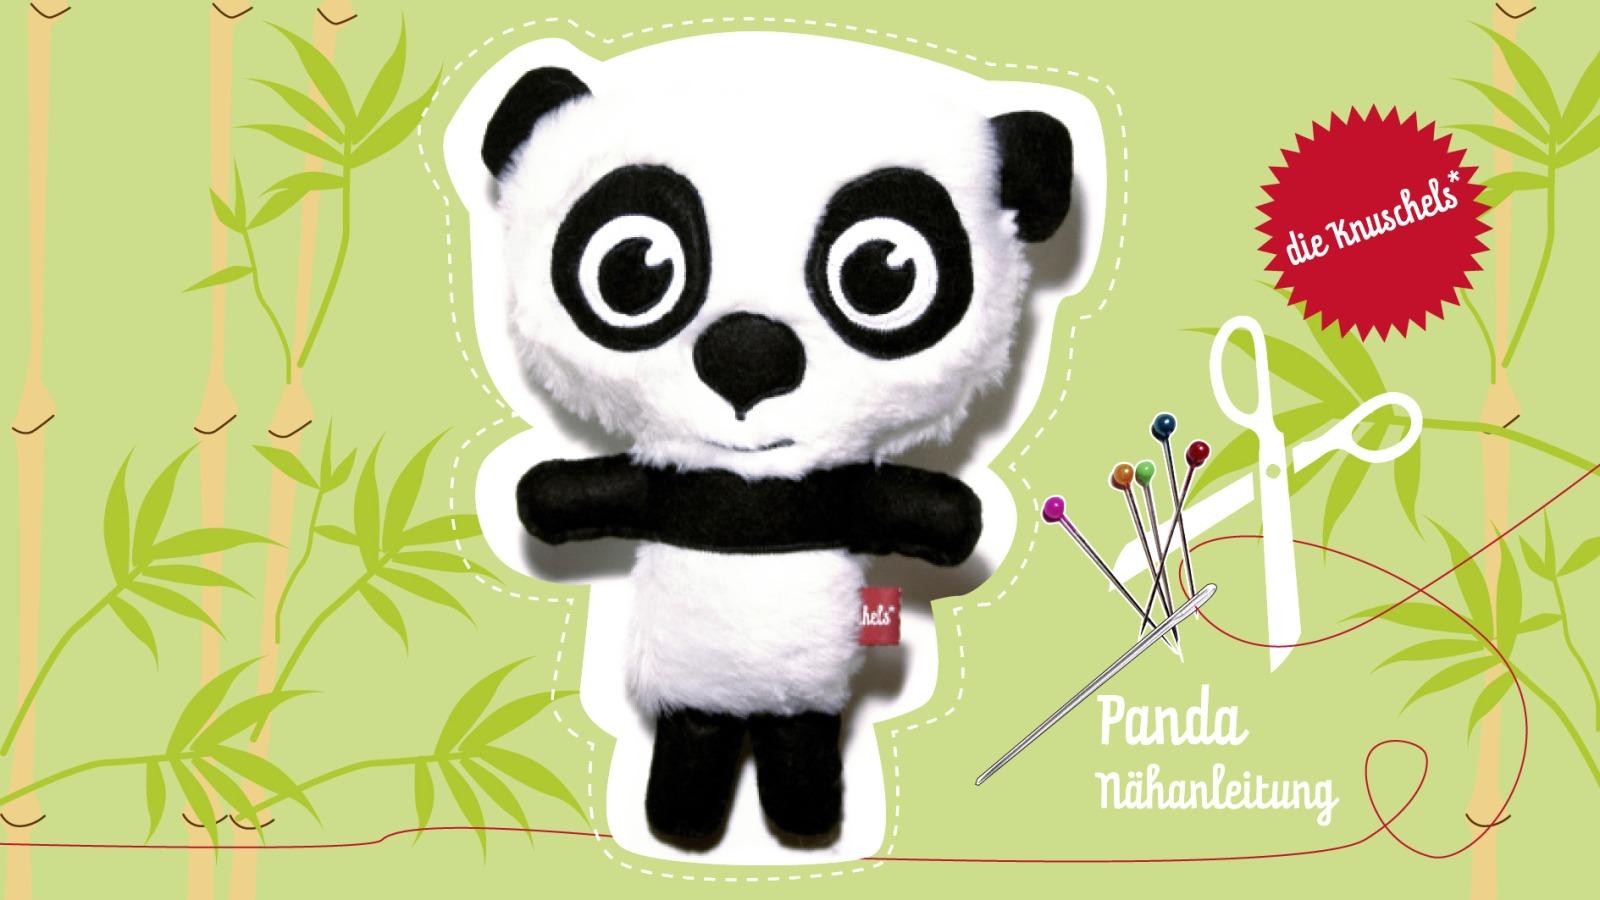 Panda Naehanleitung und Schnitt